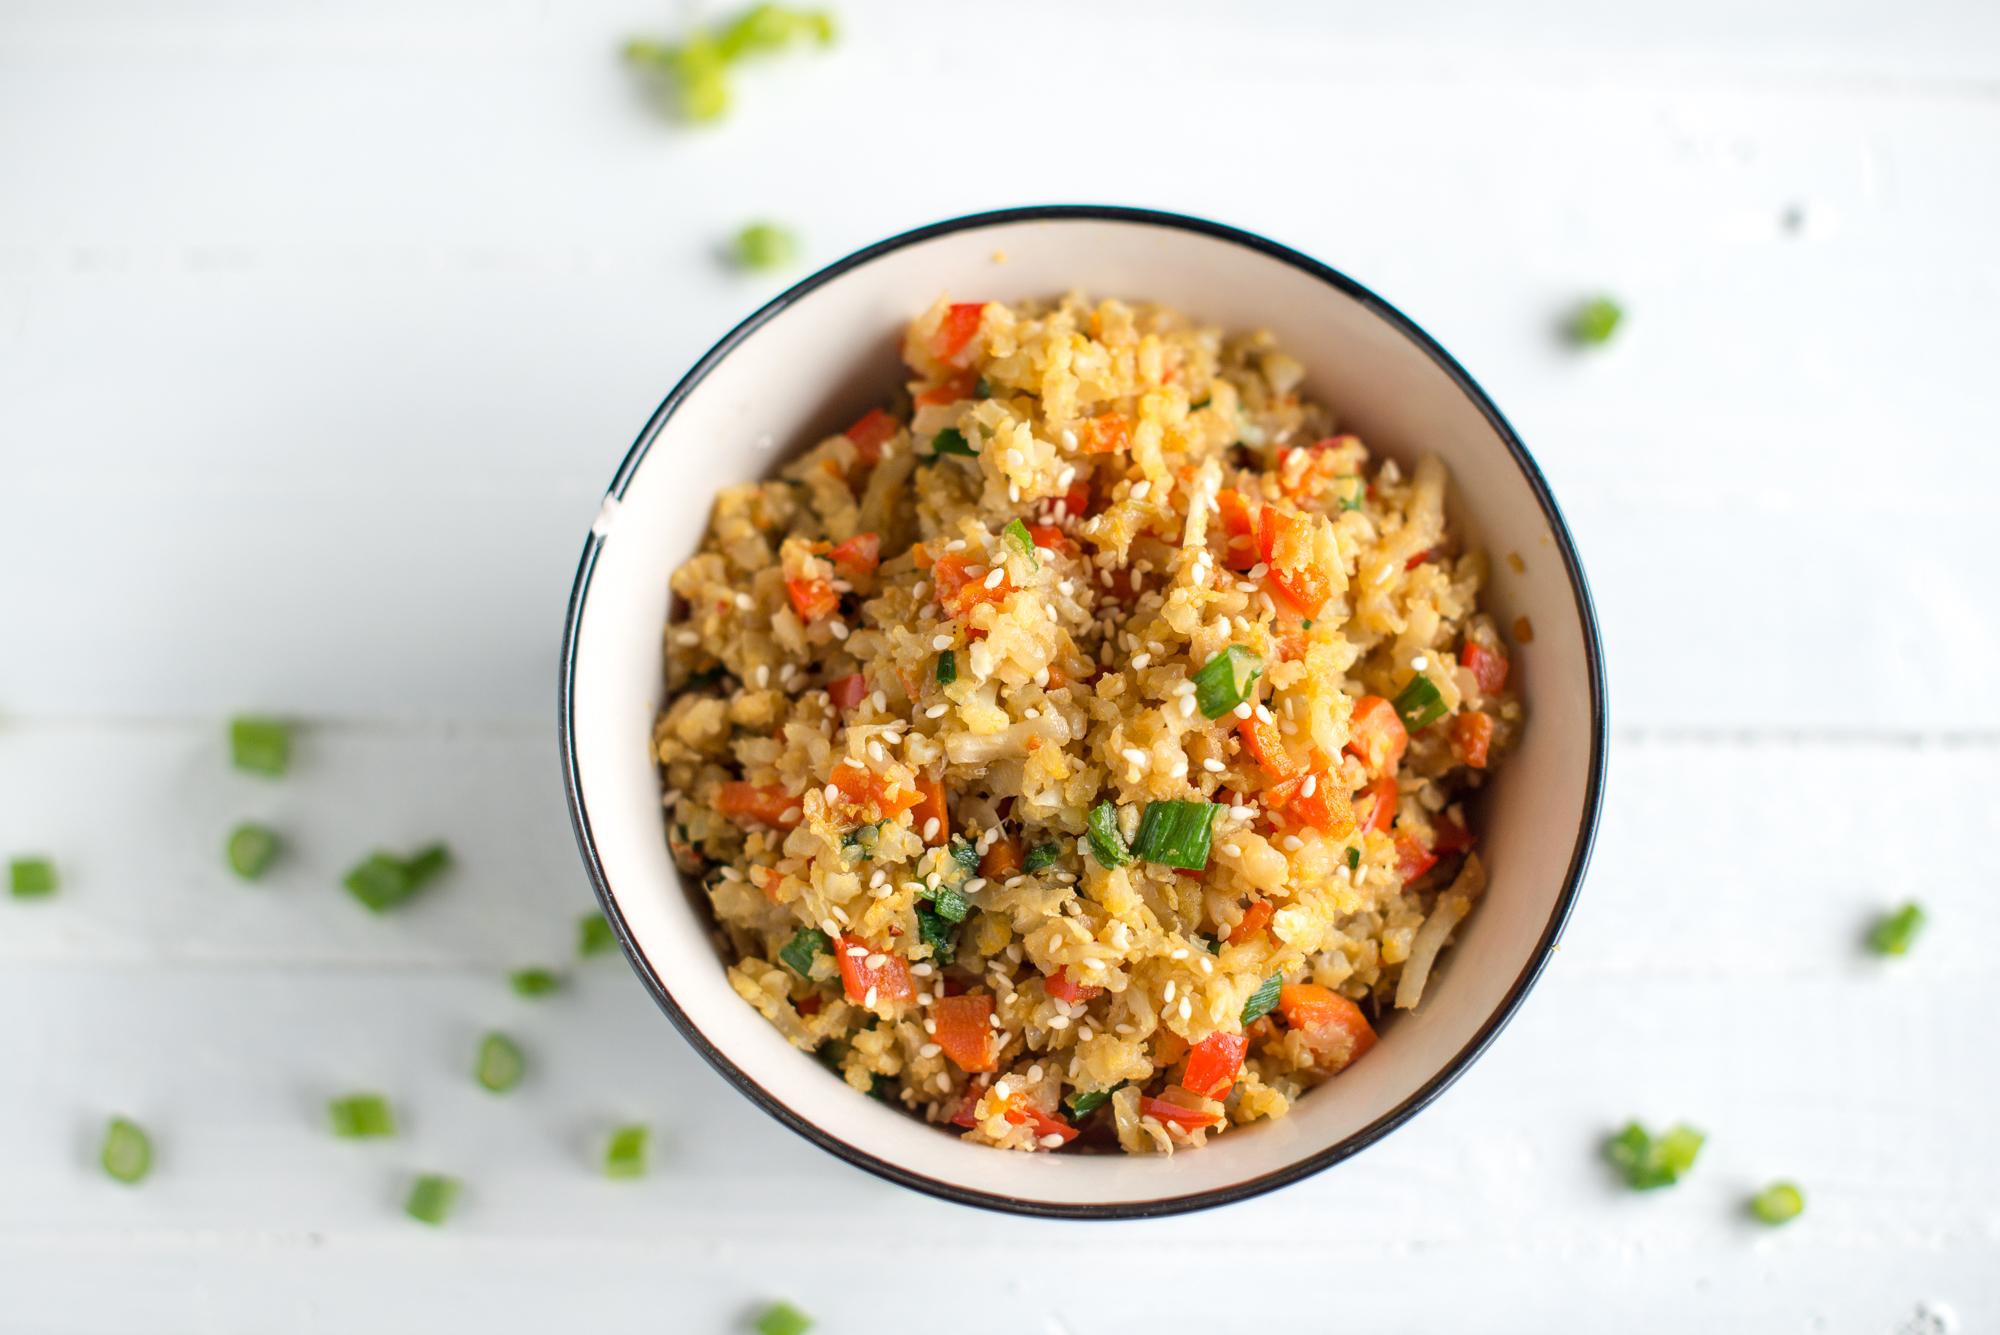 Cauliflower Fried Rice (Gluten Free, Dairy Free)